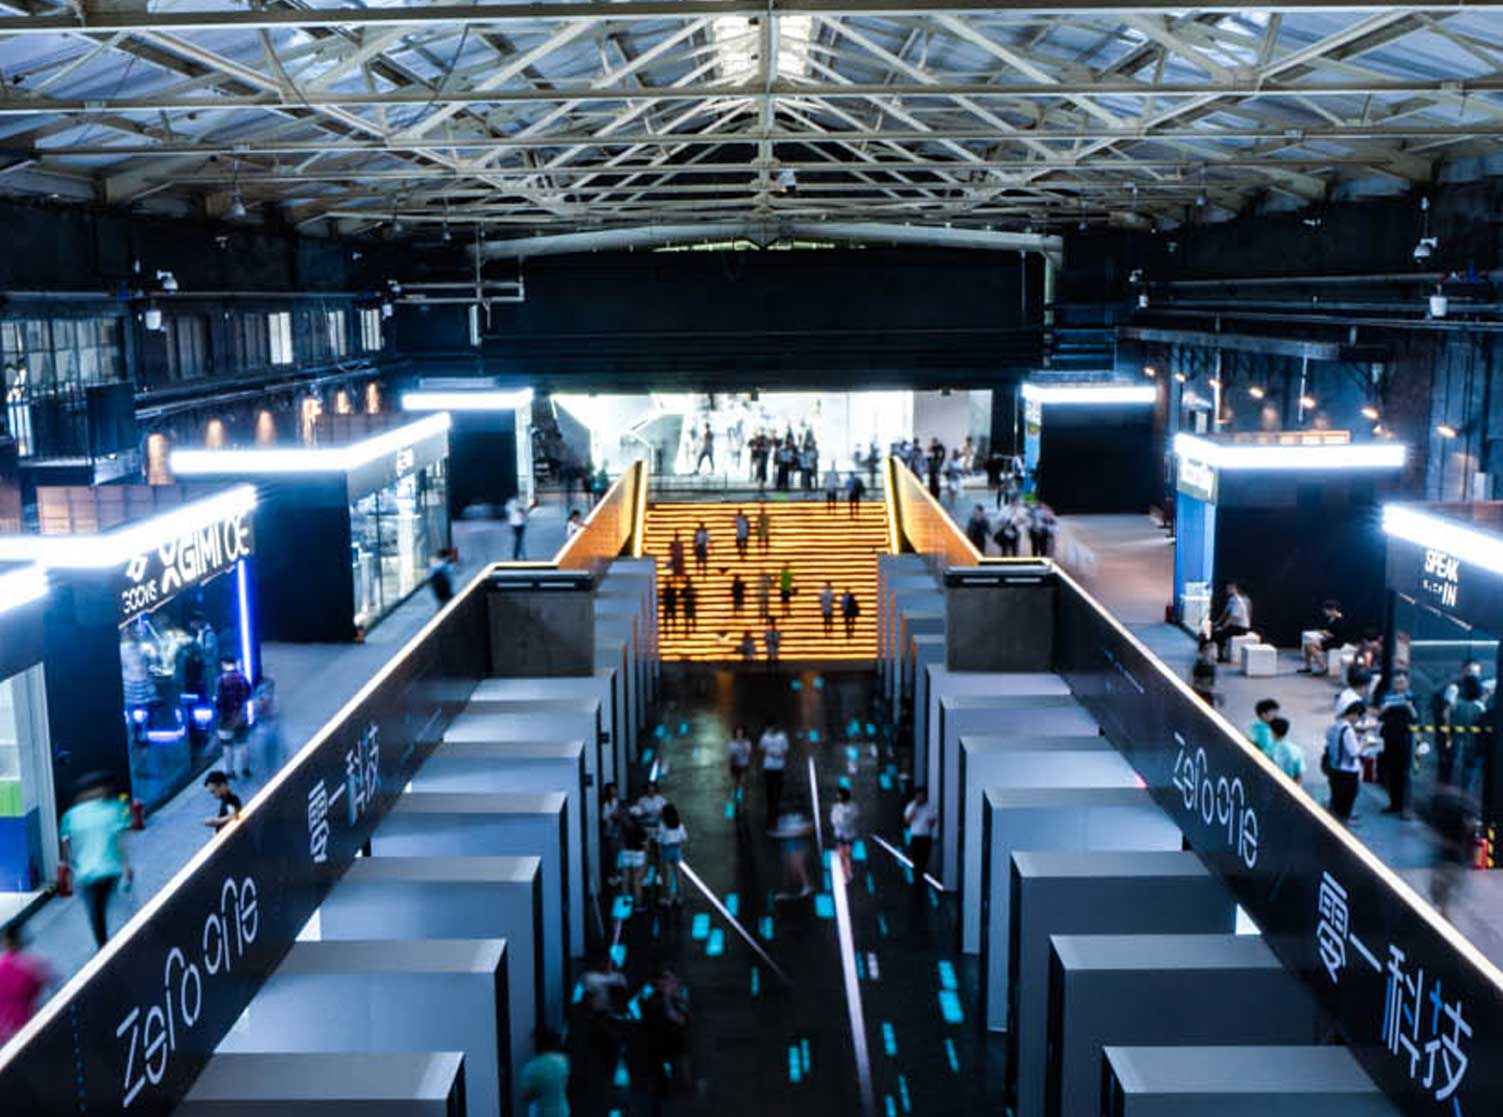 Zero One Tech Festival hall after rejuvenation